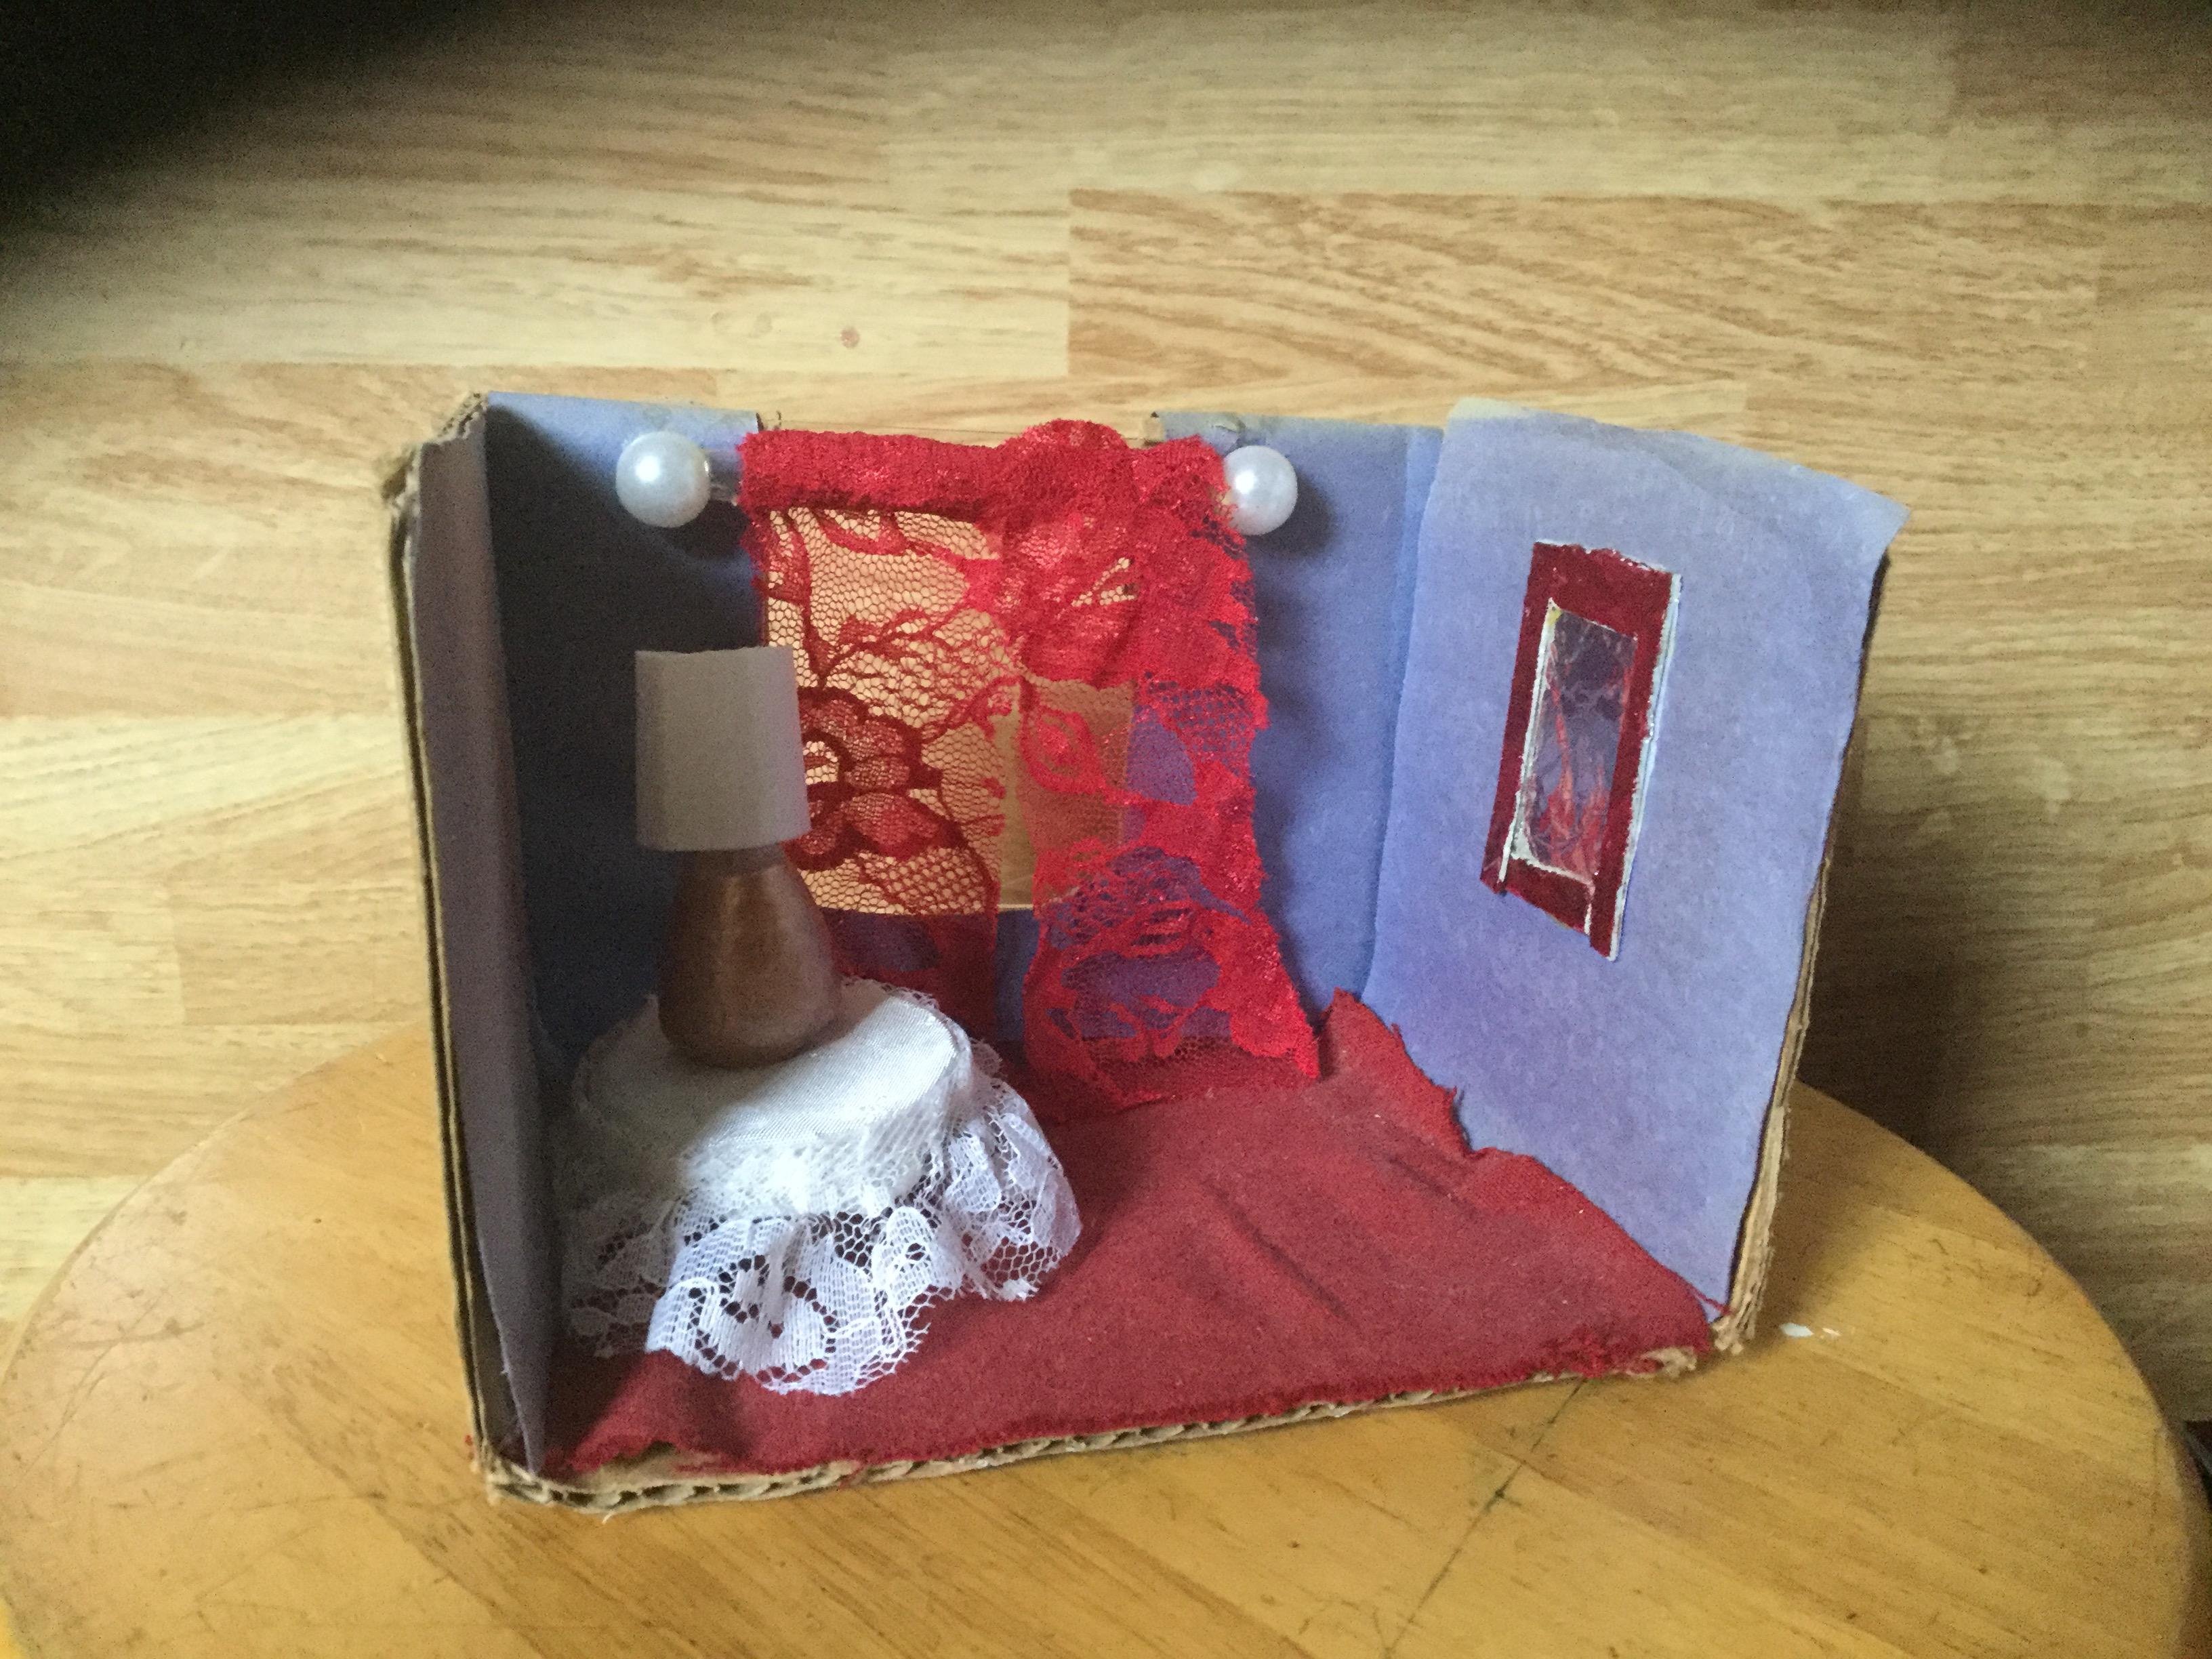 Picture of Mini-Living Room Diorama